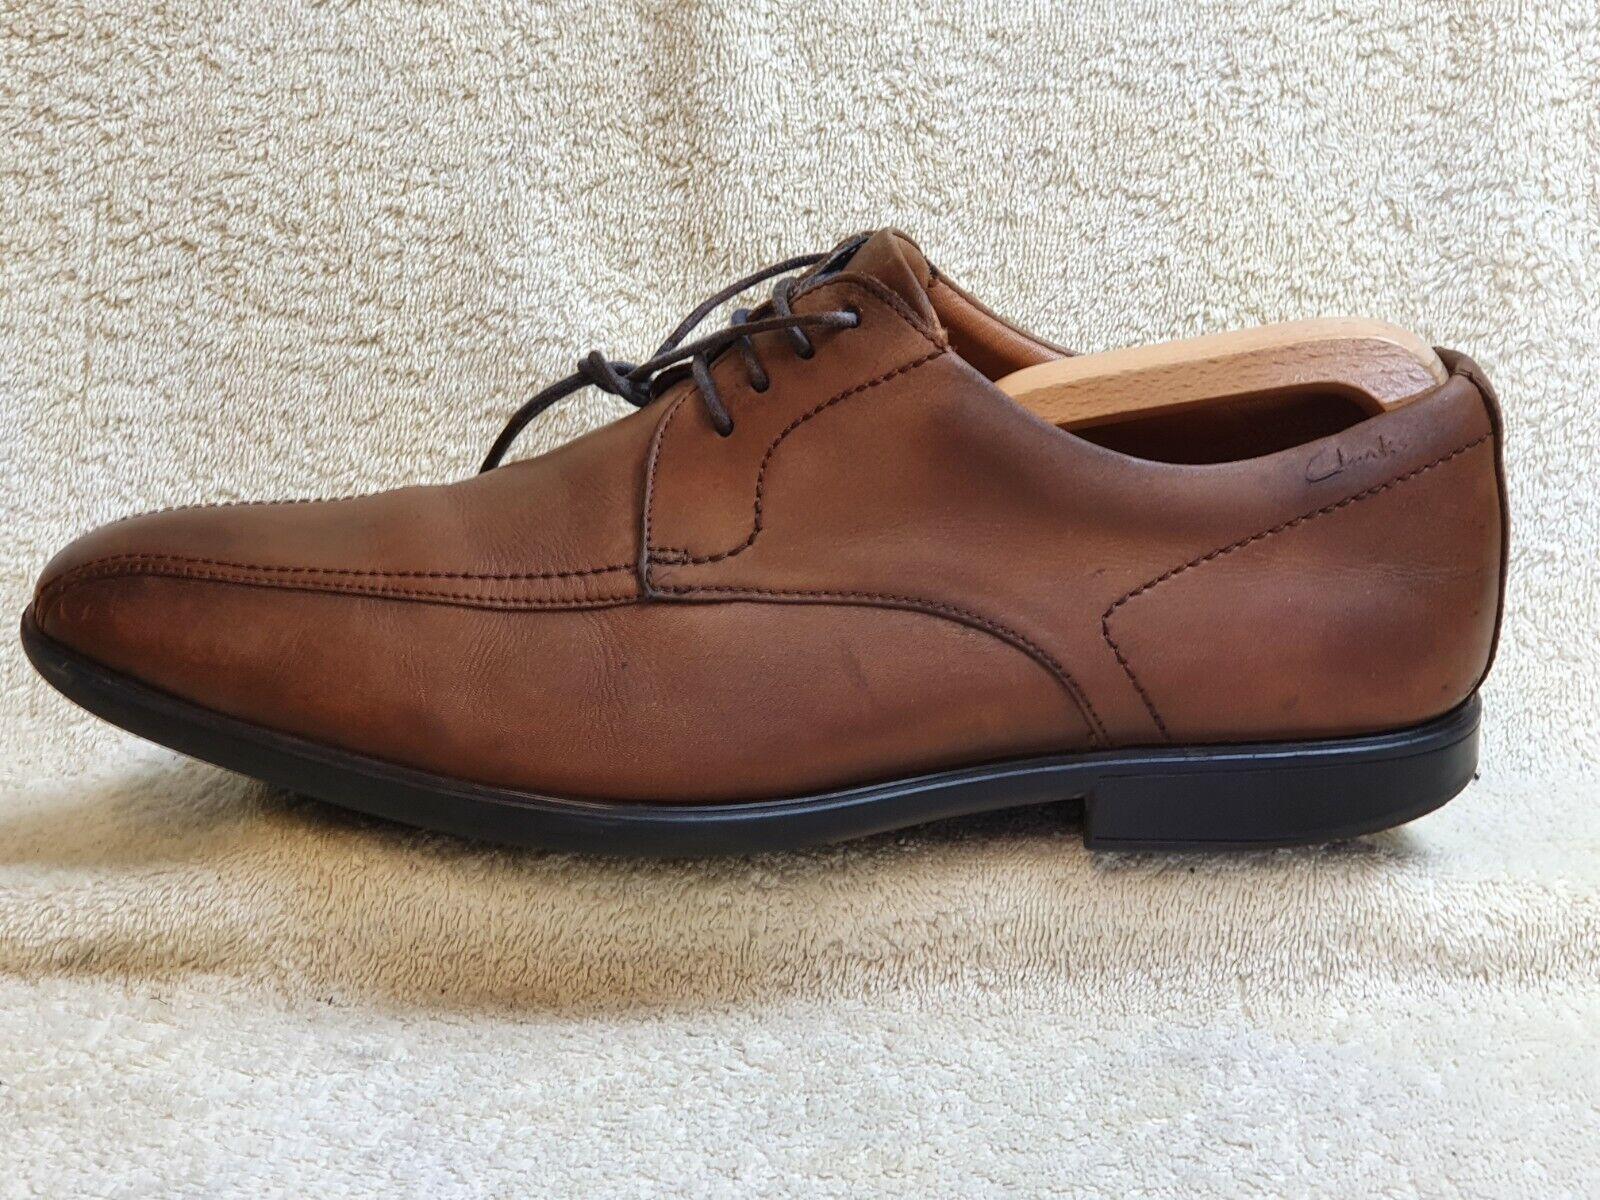 Clarks Cushion plus mens Comfort shoes Leather Brown UK 9 G EUR 43 US 10